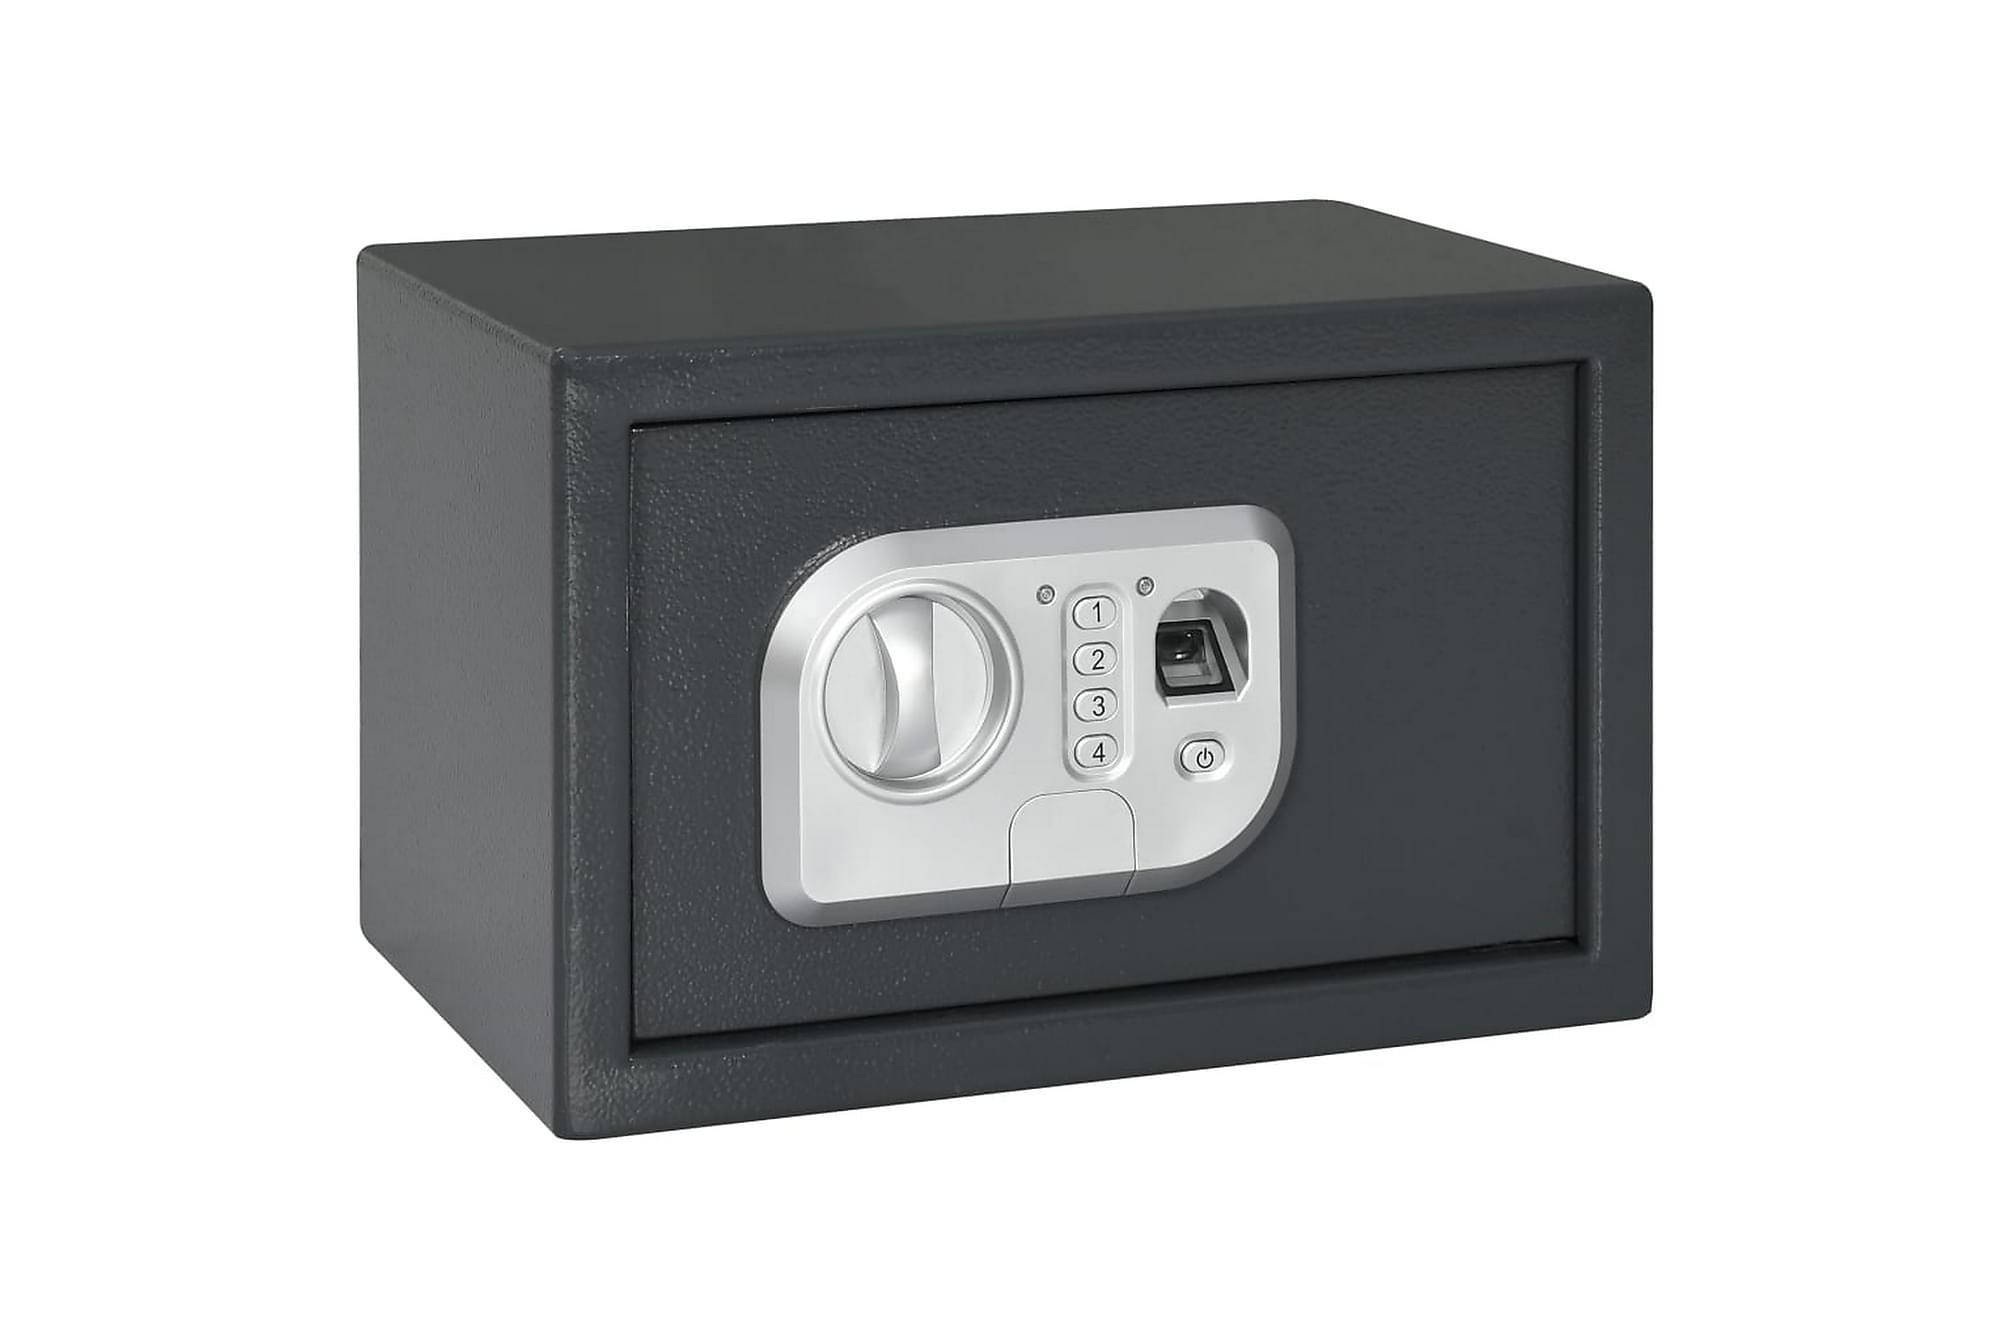 Digitalt kassaskåp med fingeravtryck mörkgrå 31x20x20 cm